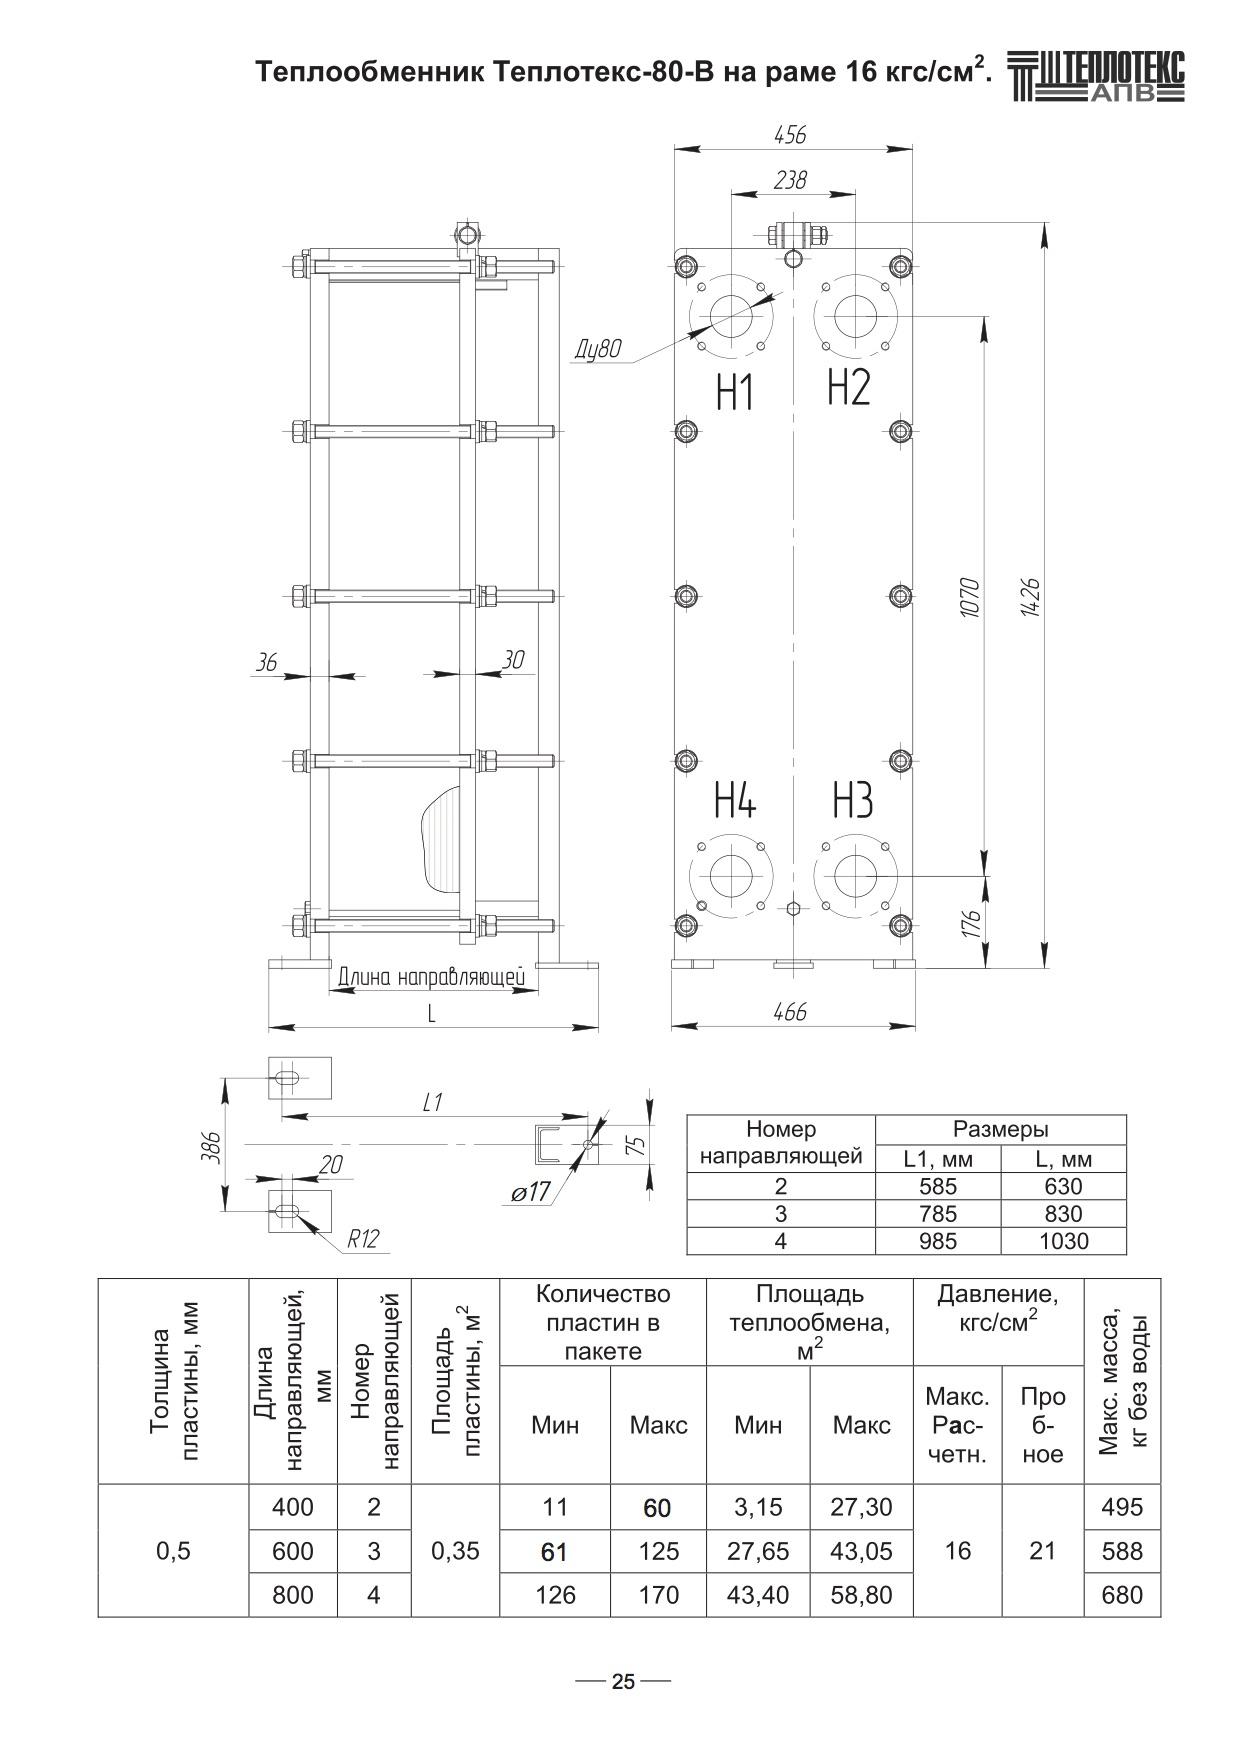 Уплотнения теплообменника Теплотекс 80A Москва Кожухотрубный теплообменник Alfa Laval ViscoLine VLM 4x20/70-6 Пенза